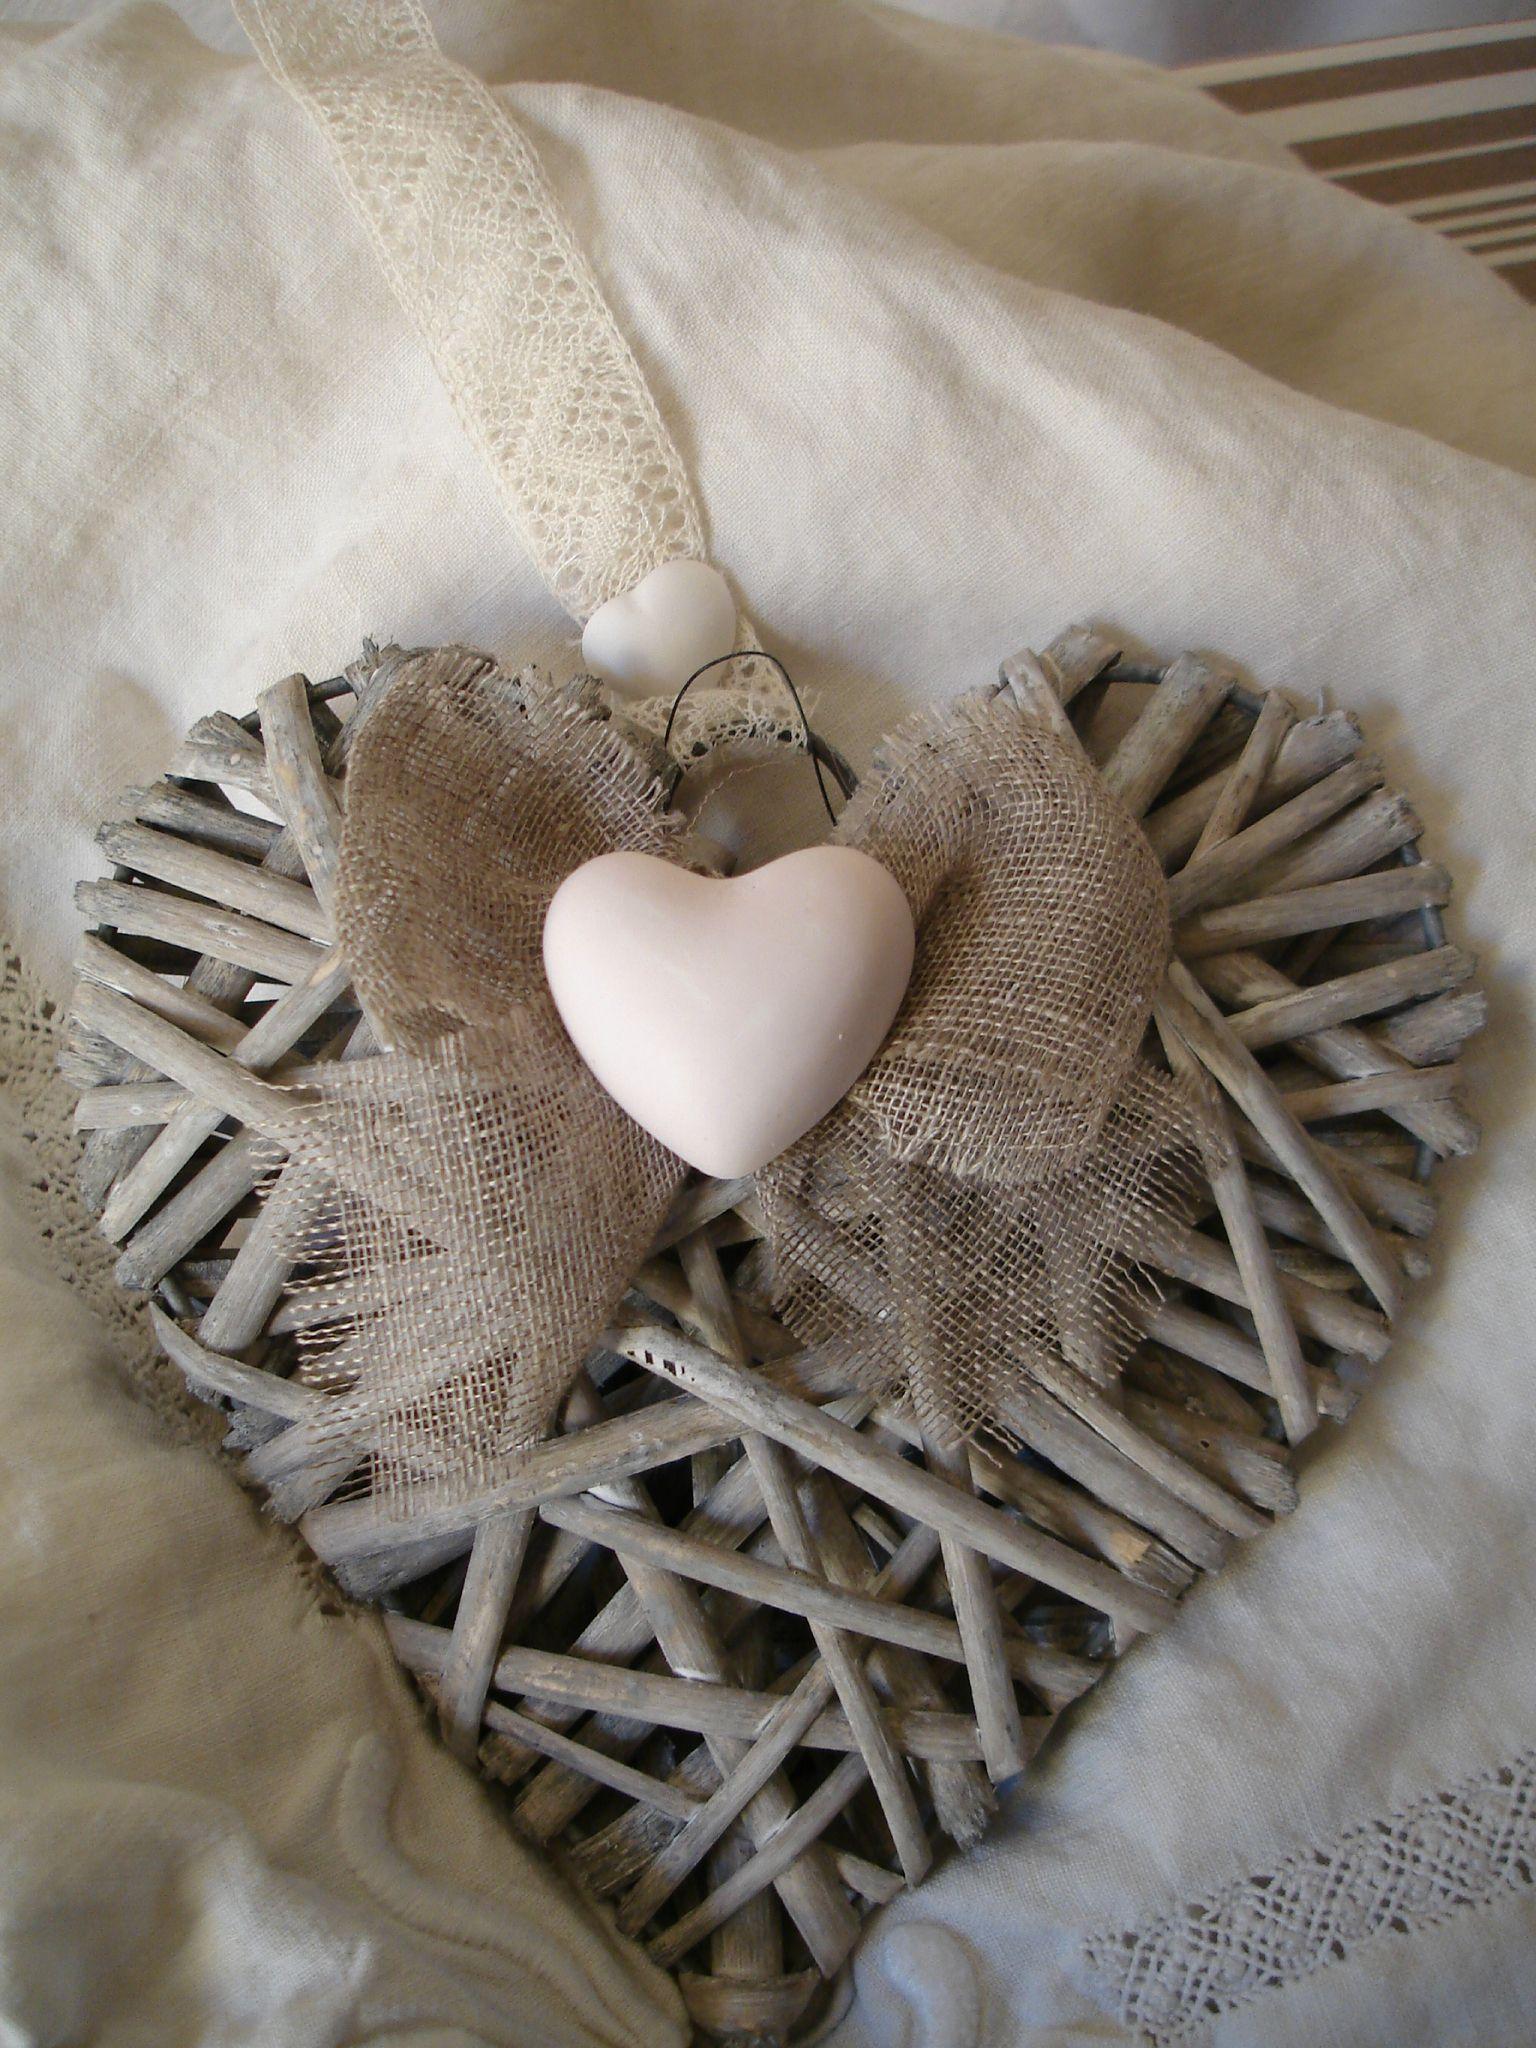 Coeur en rotin petits objets d co diy pinterest for Petit objet deco